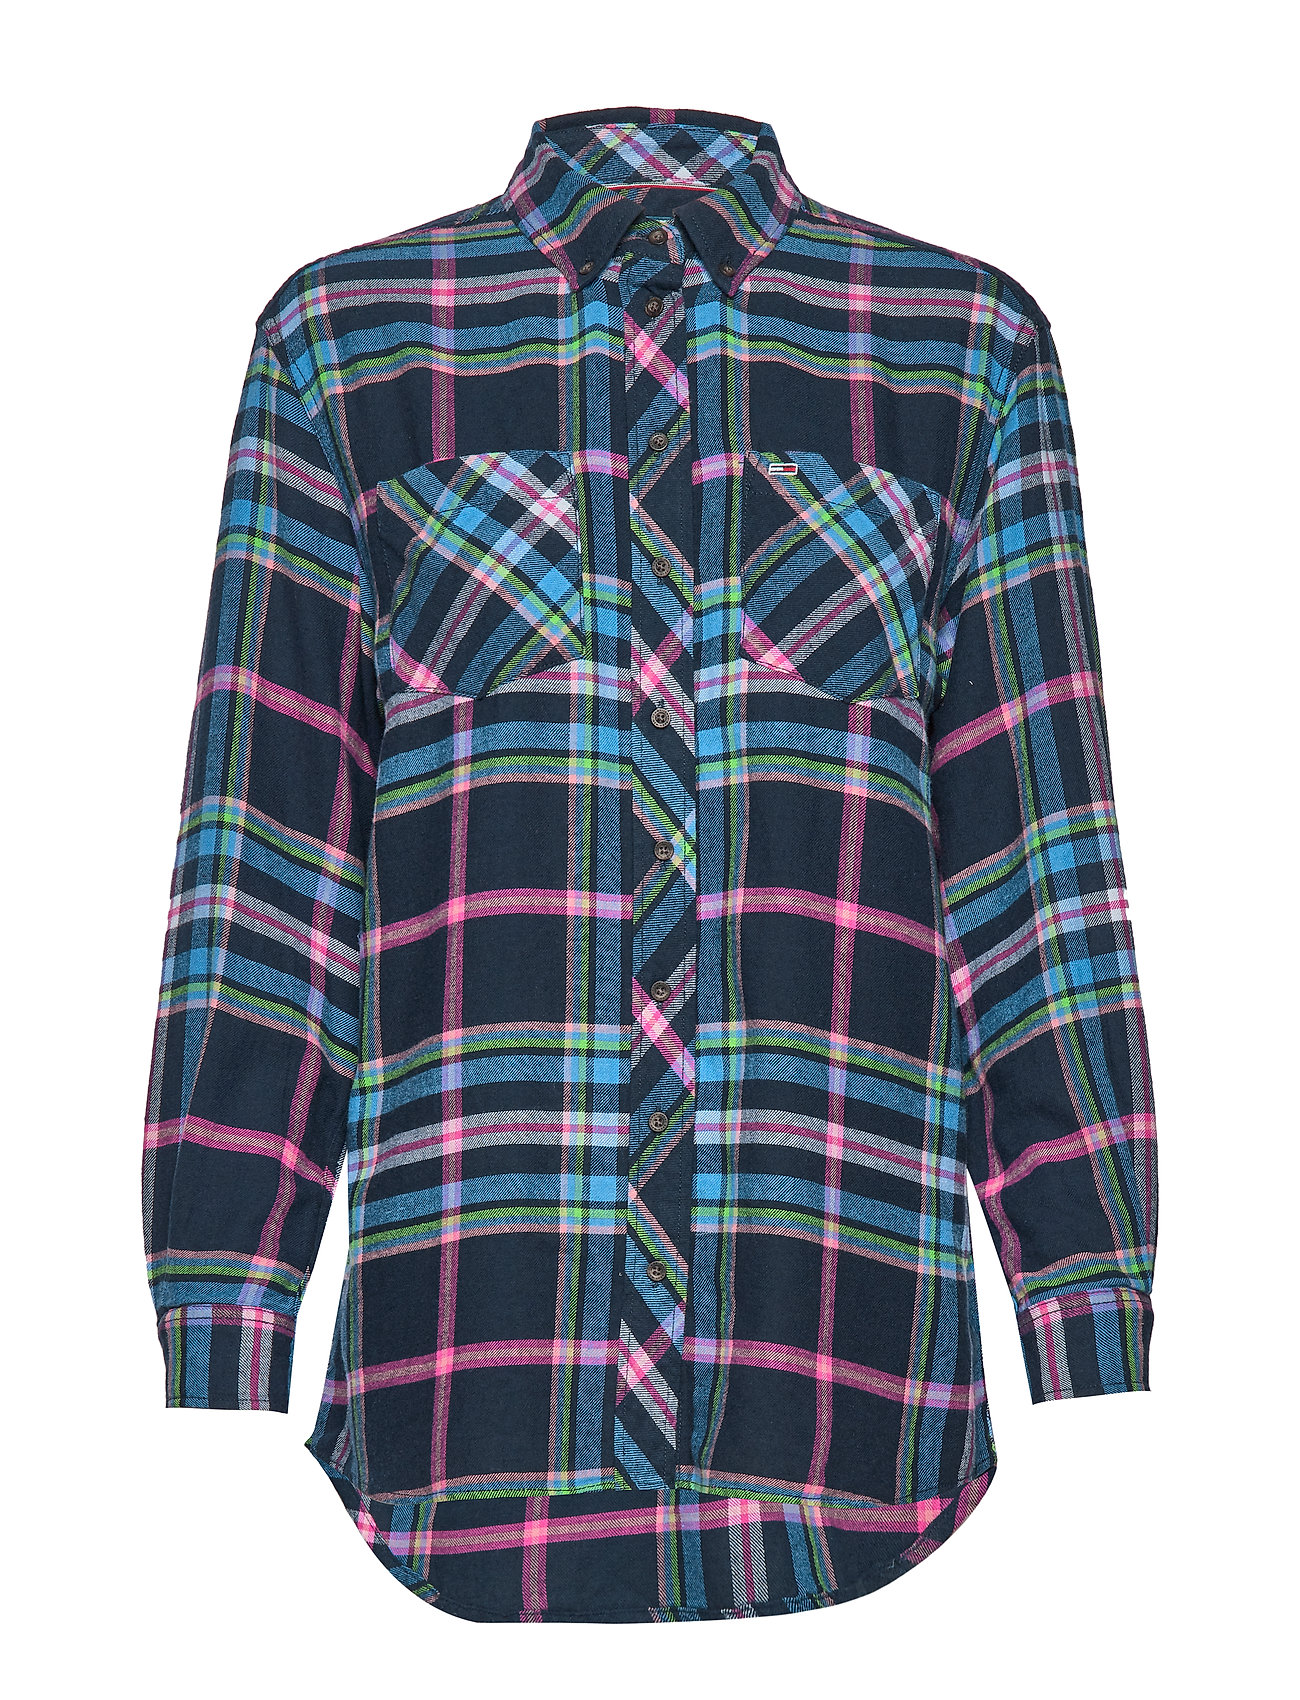 Tommy Jeans TJW MODERN CHECK SHIRT - MAZARINE BLUE / CHECK